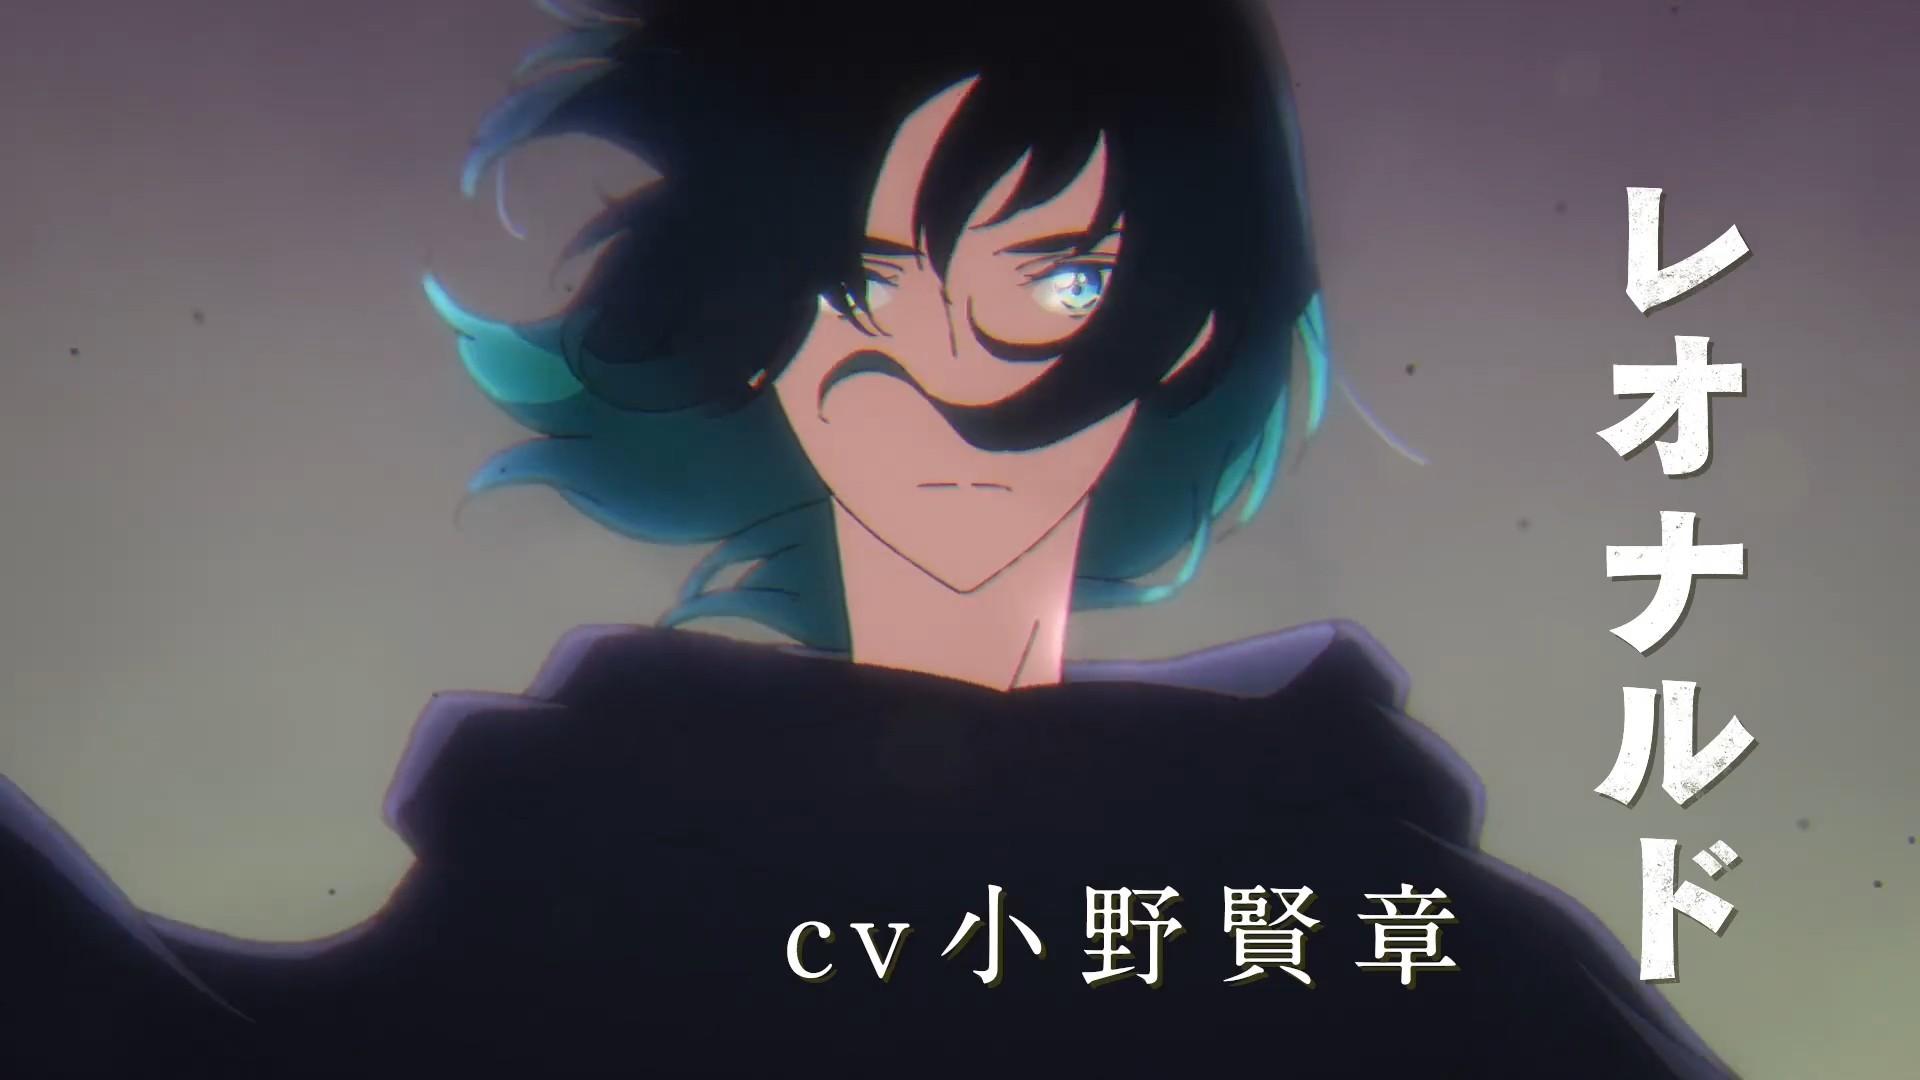 TV动画《体操武士》正式PV公开,10月10日开播- ACG17.COM